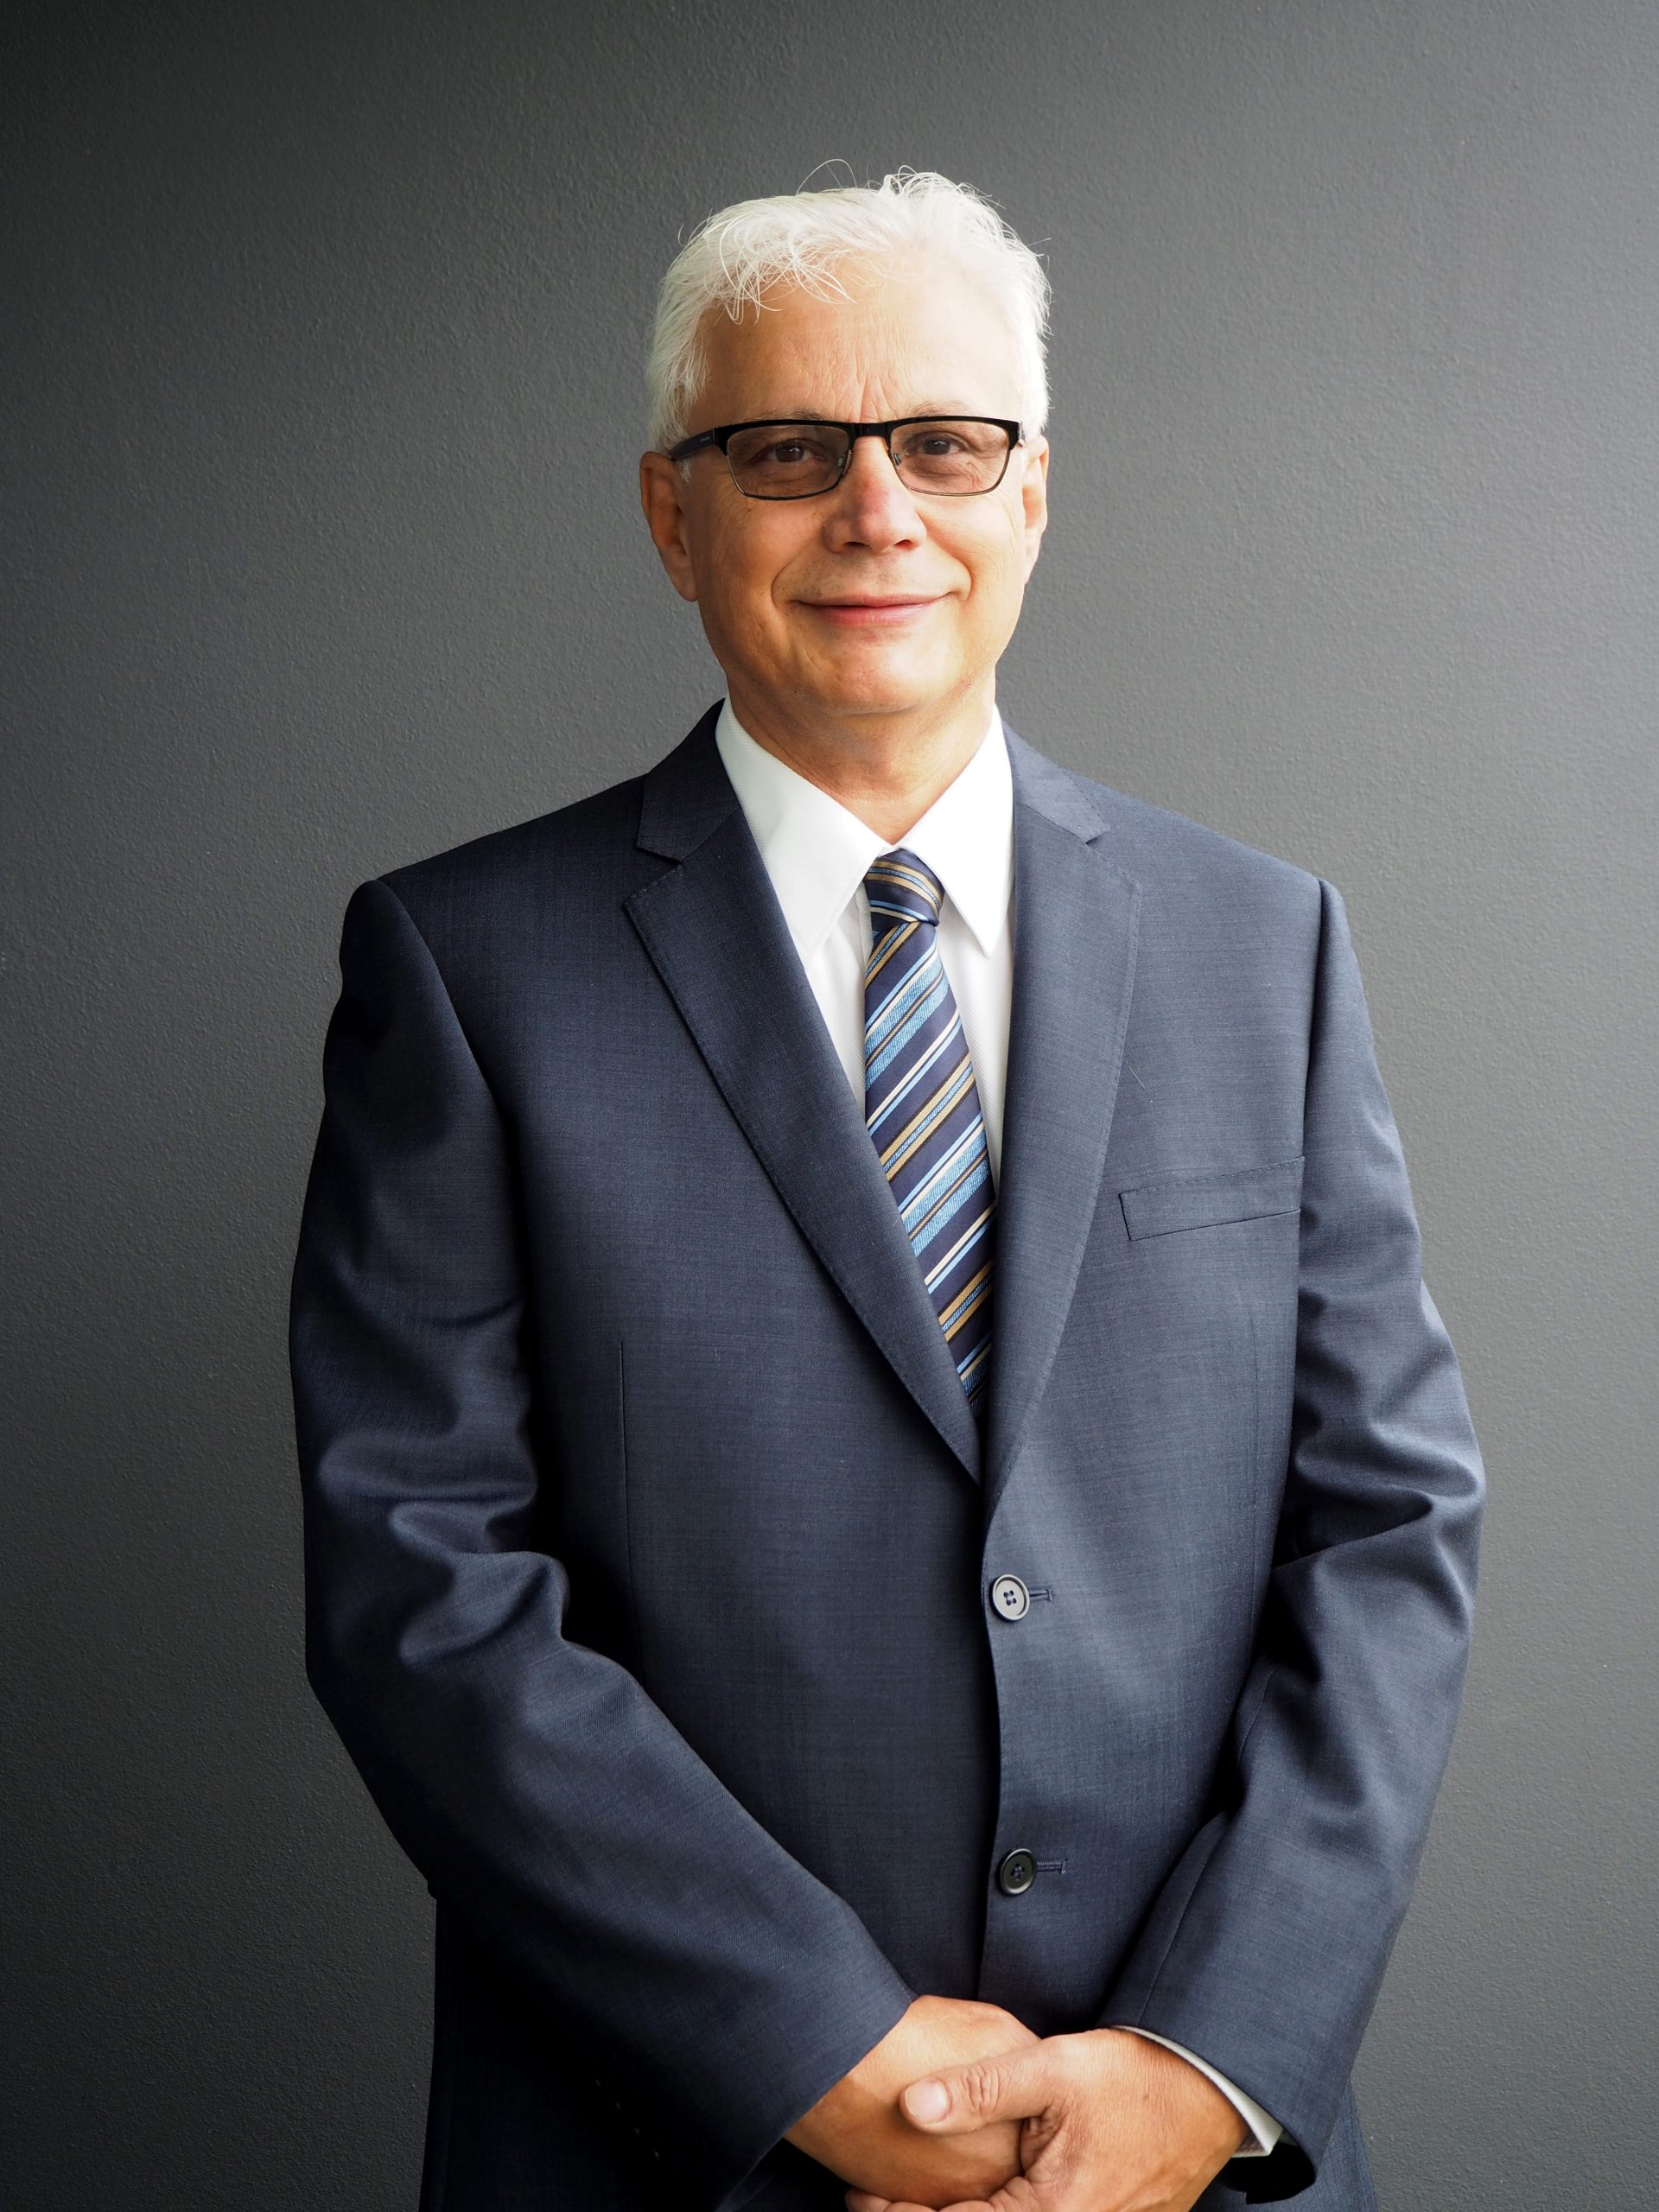 Antonio Fantasia